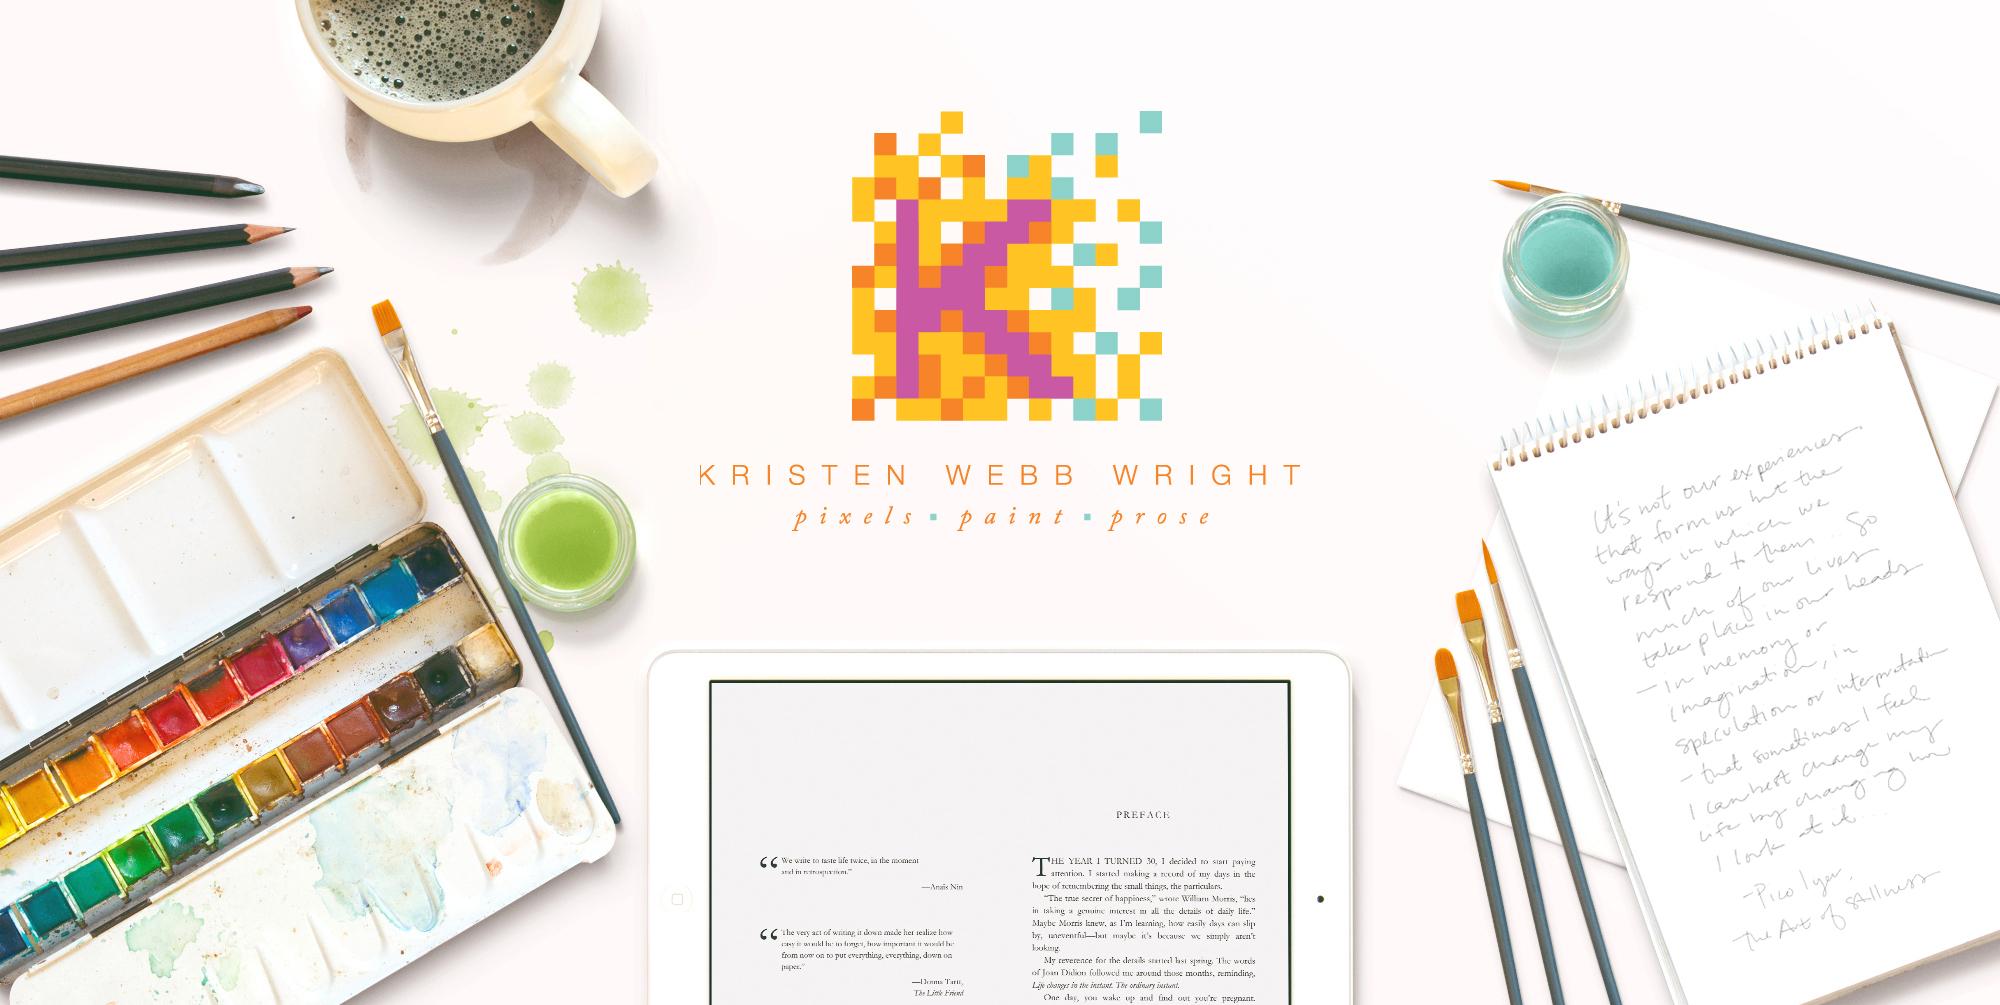 Kristen Webb Wright